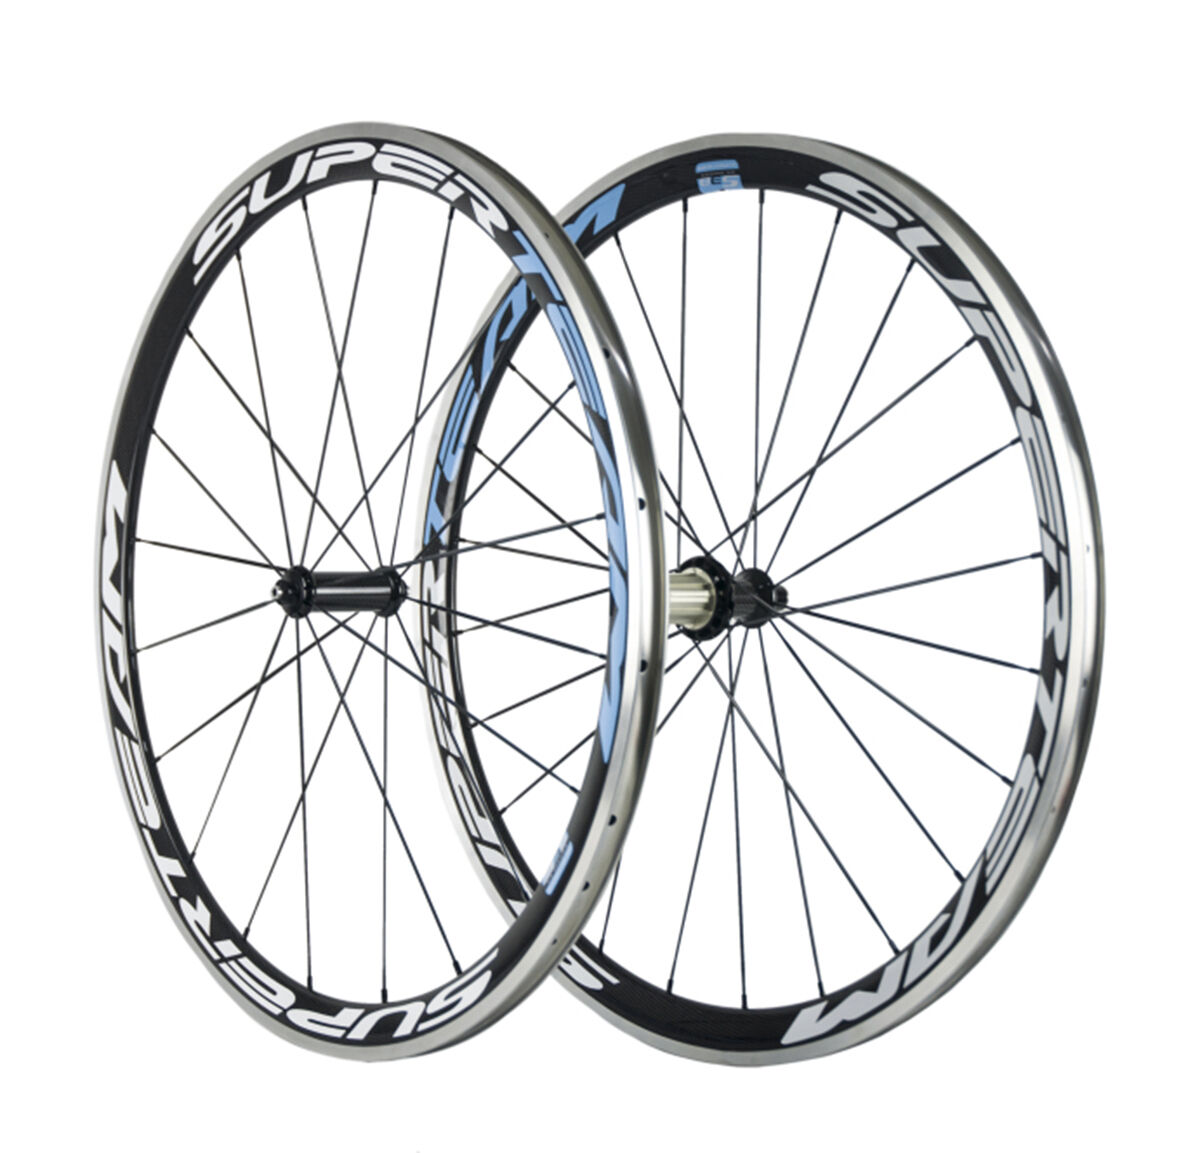 Superteam 38mm Clincher Powerway R36 Hub Carbon Wheels Aluminum  Braking line F&R  cheapest price